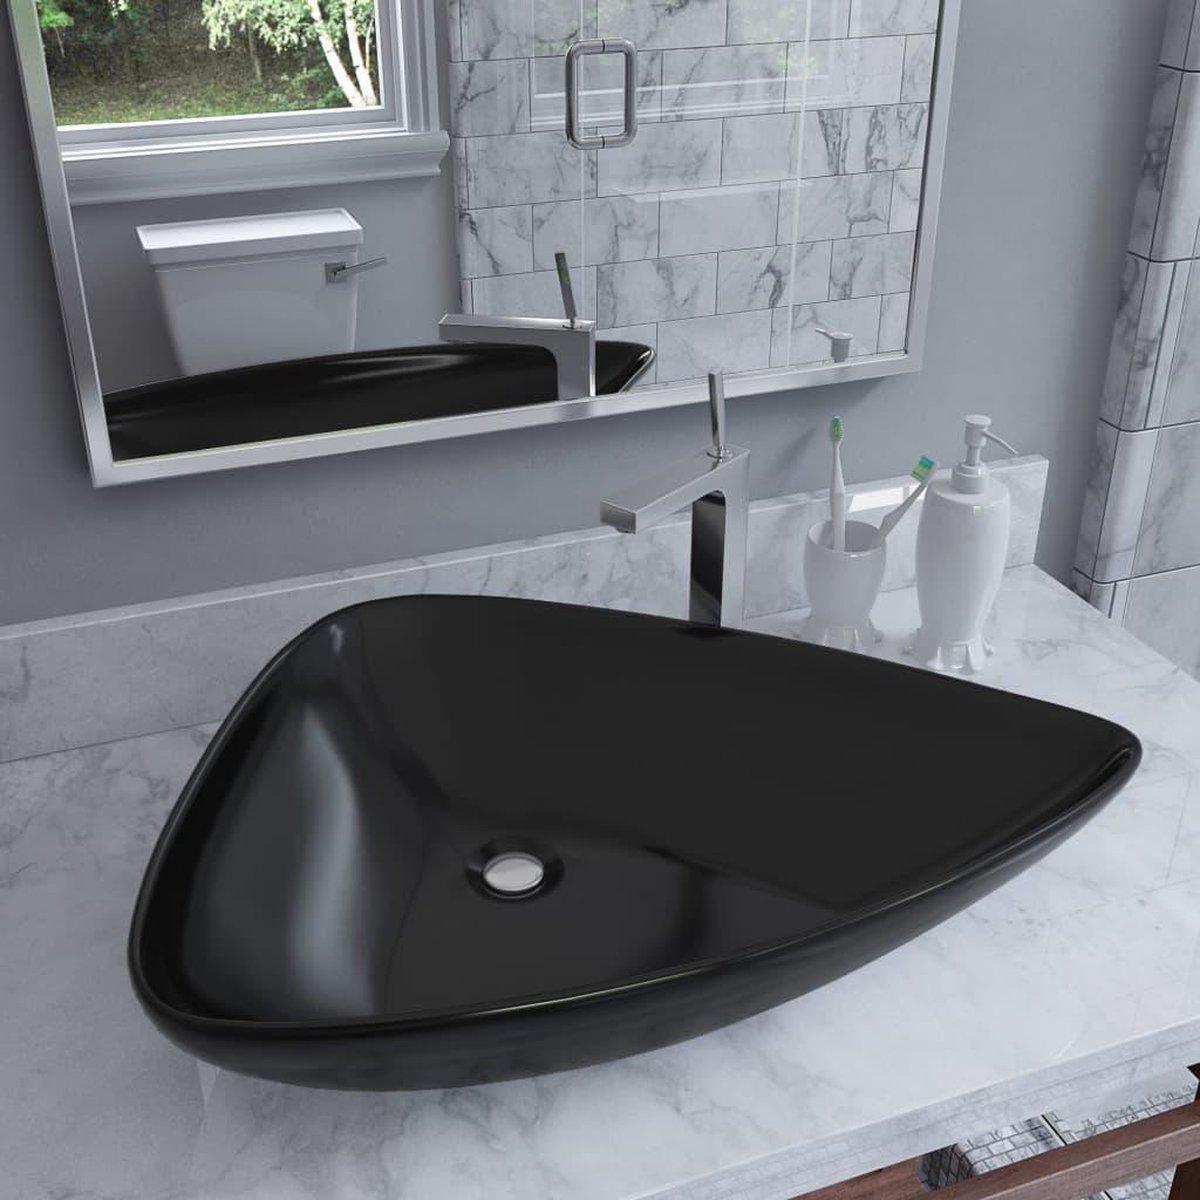 Wastafel driehoekig 645x455x115 mm keramiek zwart